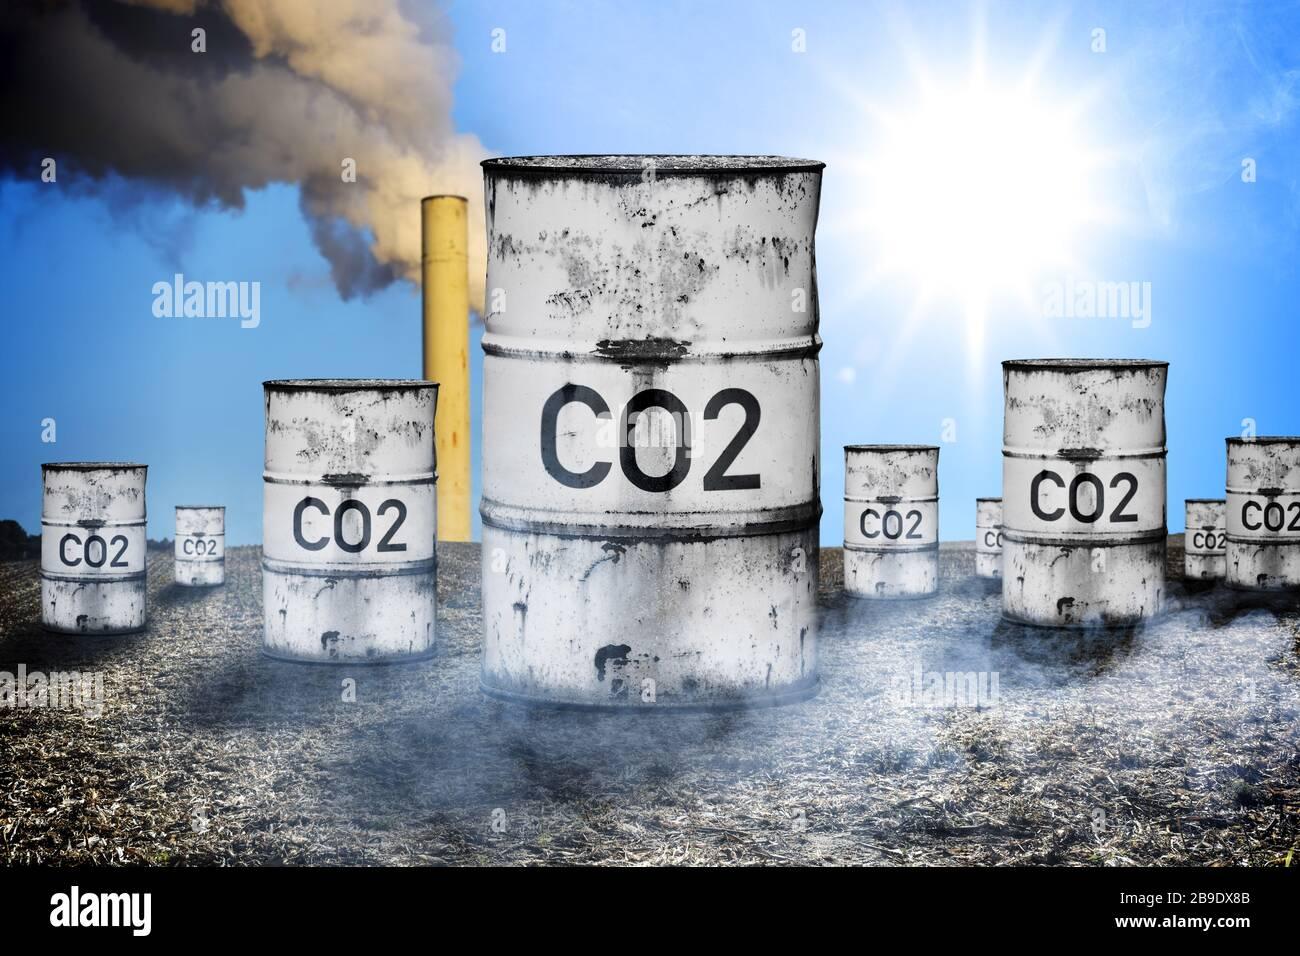 PHOTOMONTAGE, tonnes with label CO2, symbolic photo CO2-Bepreisung and CO2 tax, FOTOMONTAGE, Tonnen mit Aufschrift CO2, Symbolfoto CO2-Bepreisung und Stock Photo